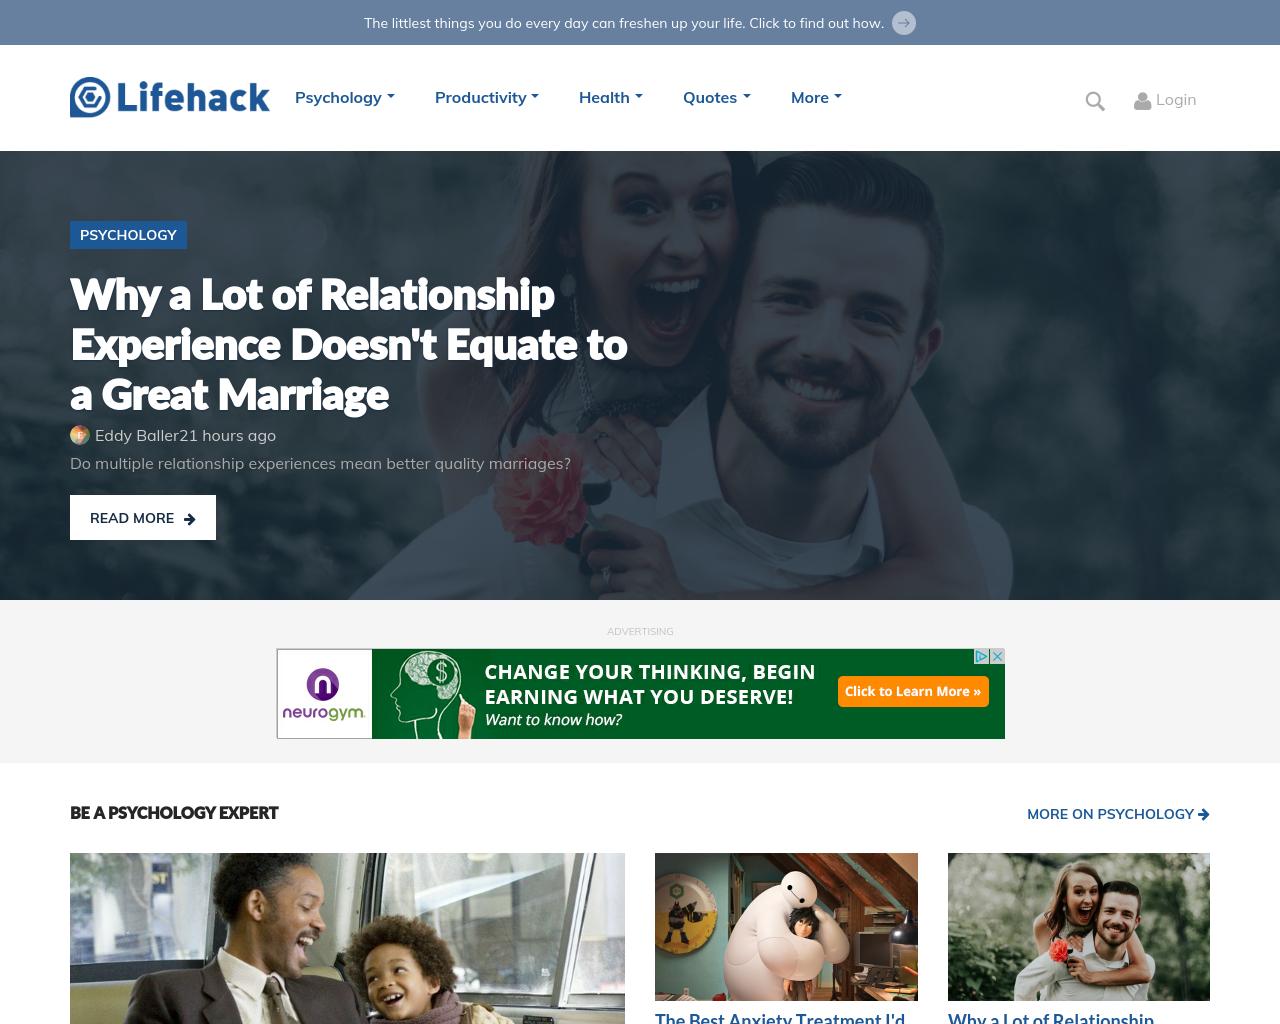 Lifehack-Advertising-Reviews-Pricing